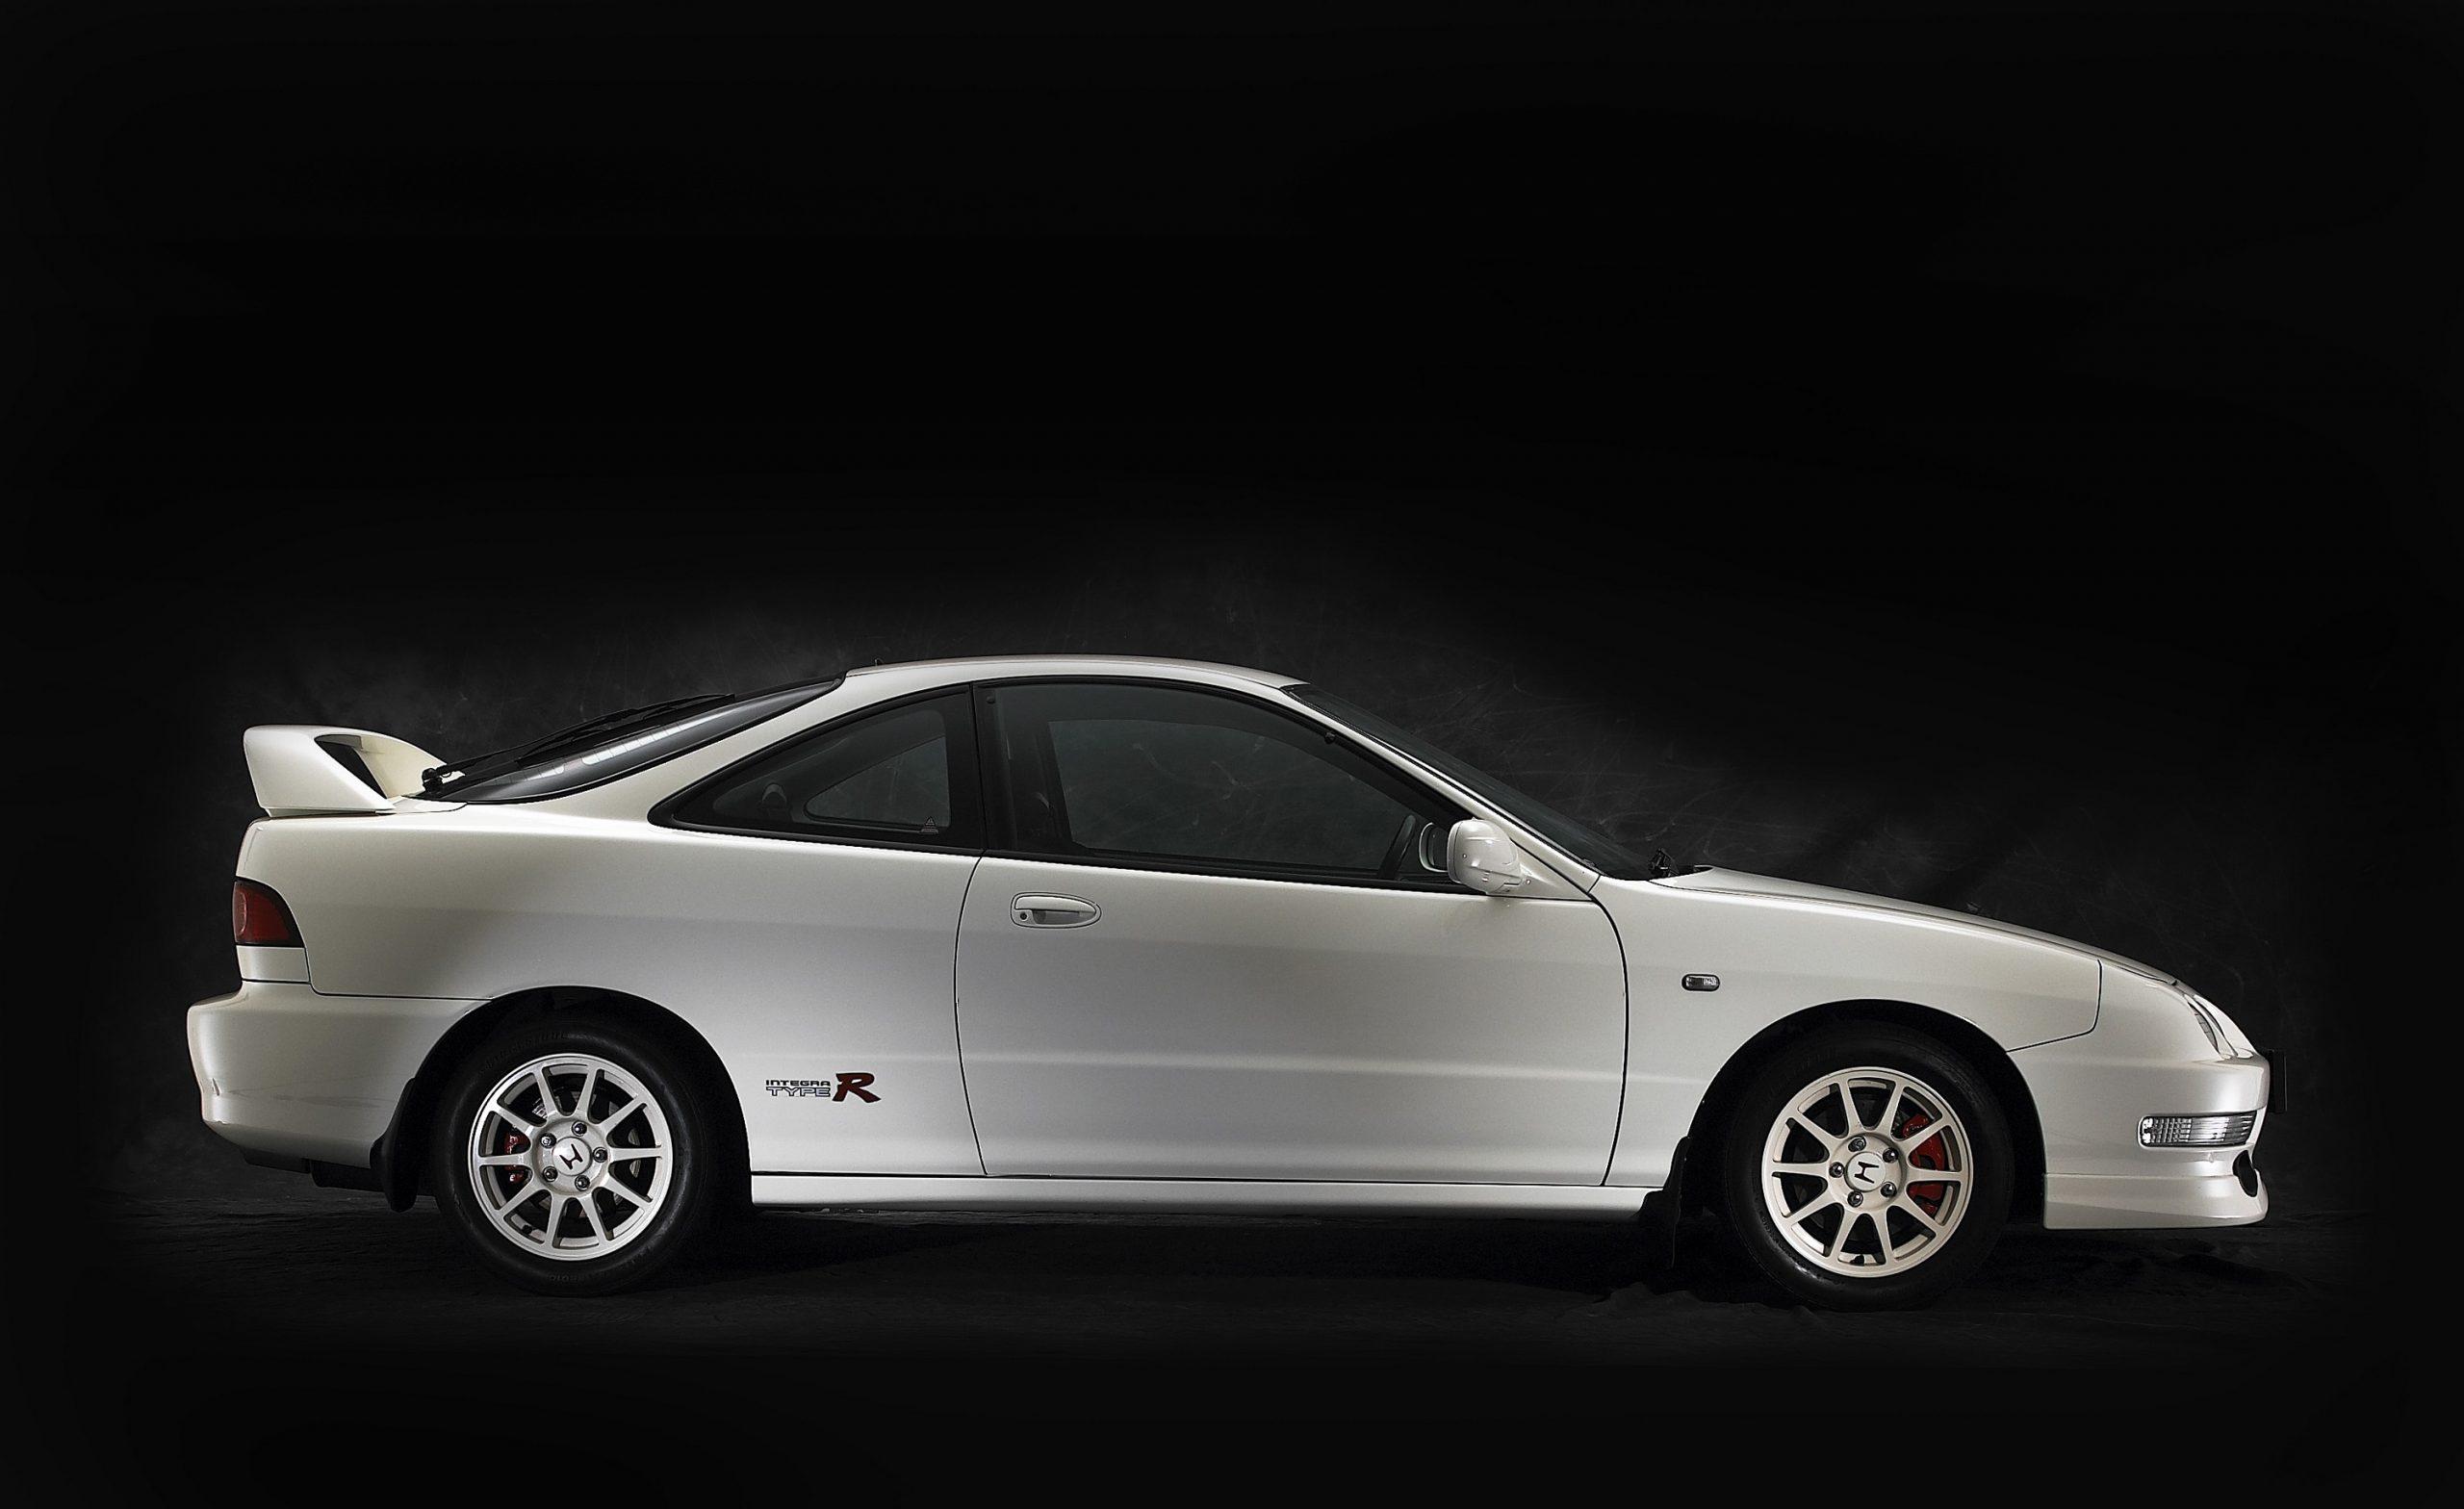 A white Acura Integra Type R shot in profile against a black studio background